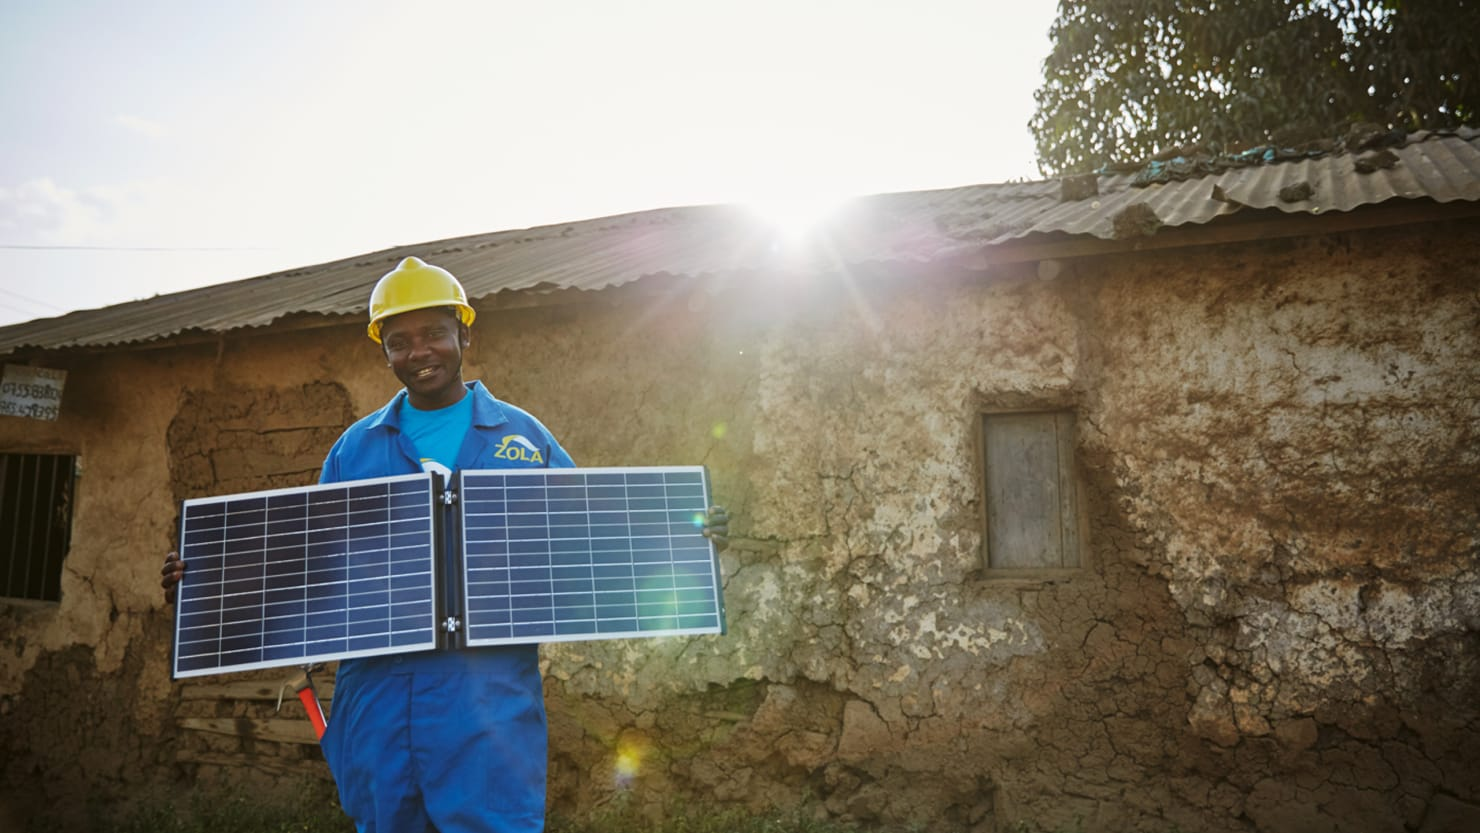 solar panel frontier energy zola bloomberg